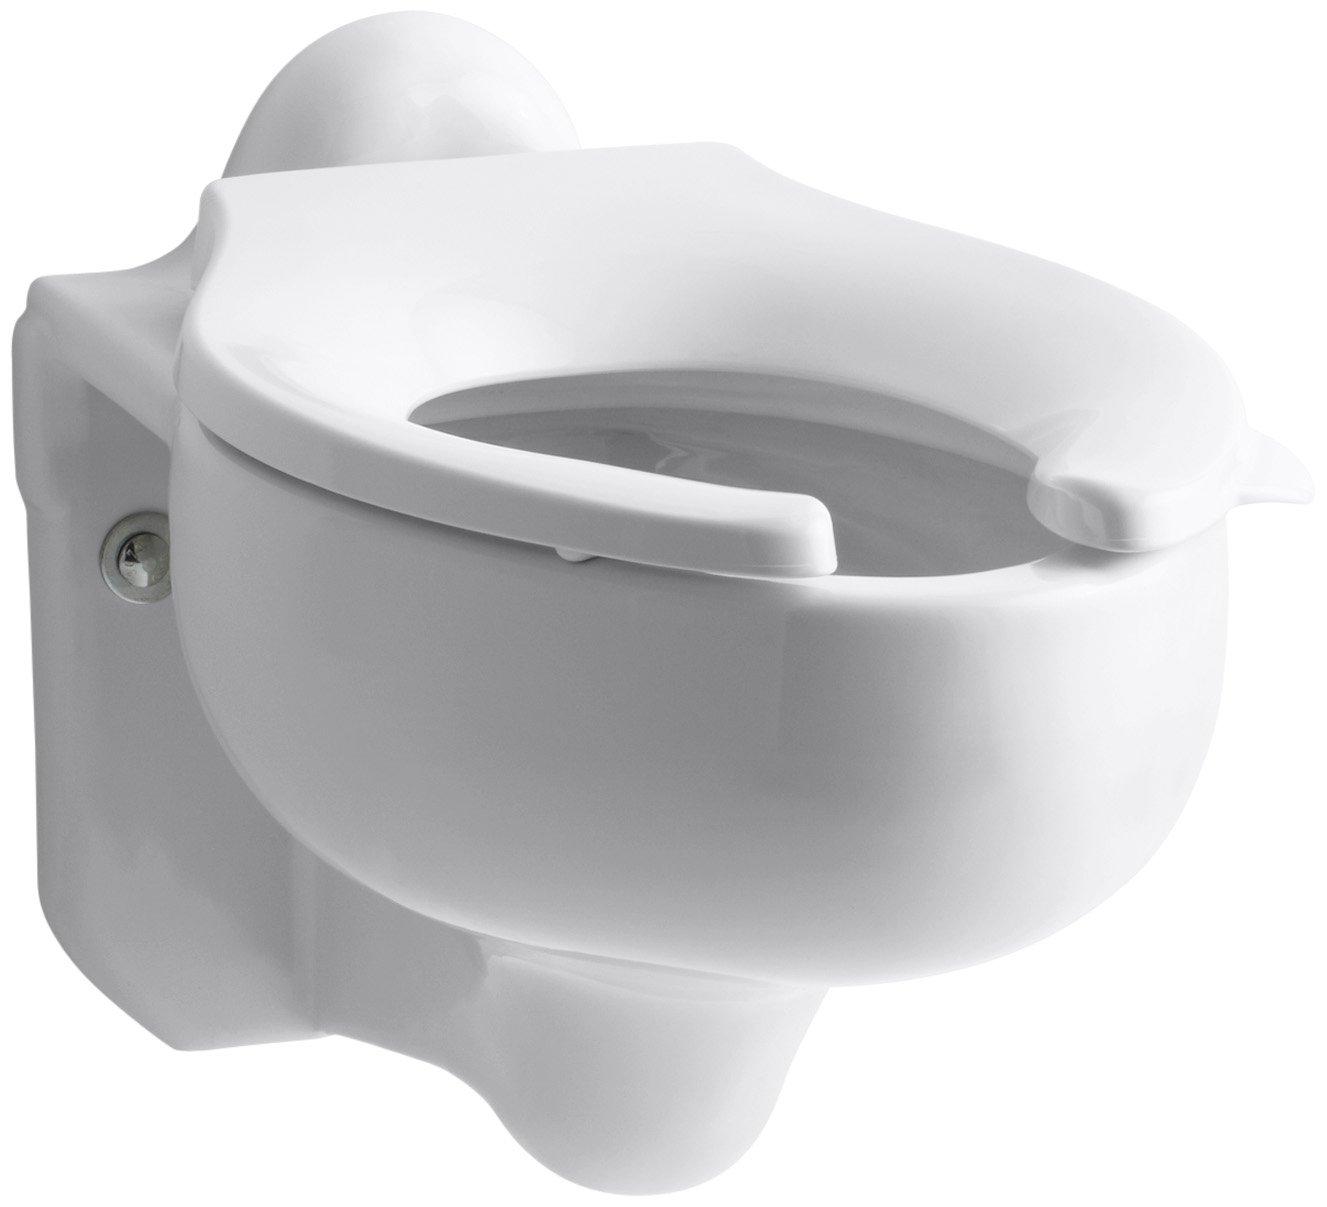 kohler k4460c0 sifton waterguard wallhung toilet bowl white amazoncom - Wall Hung Toilet